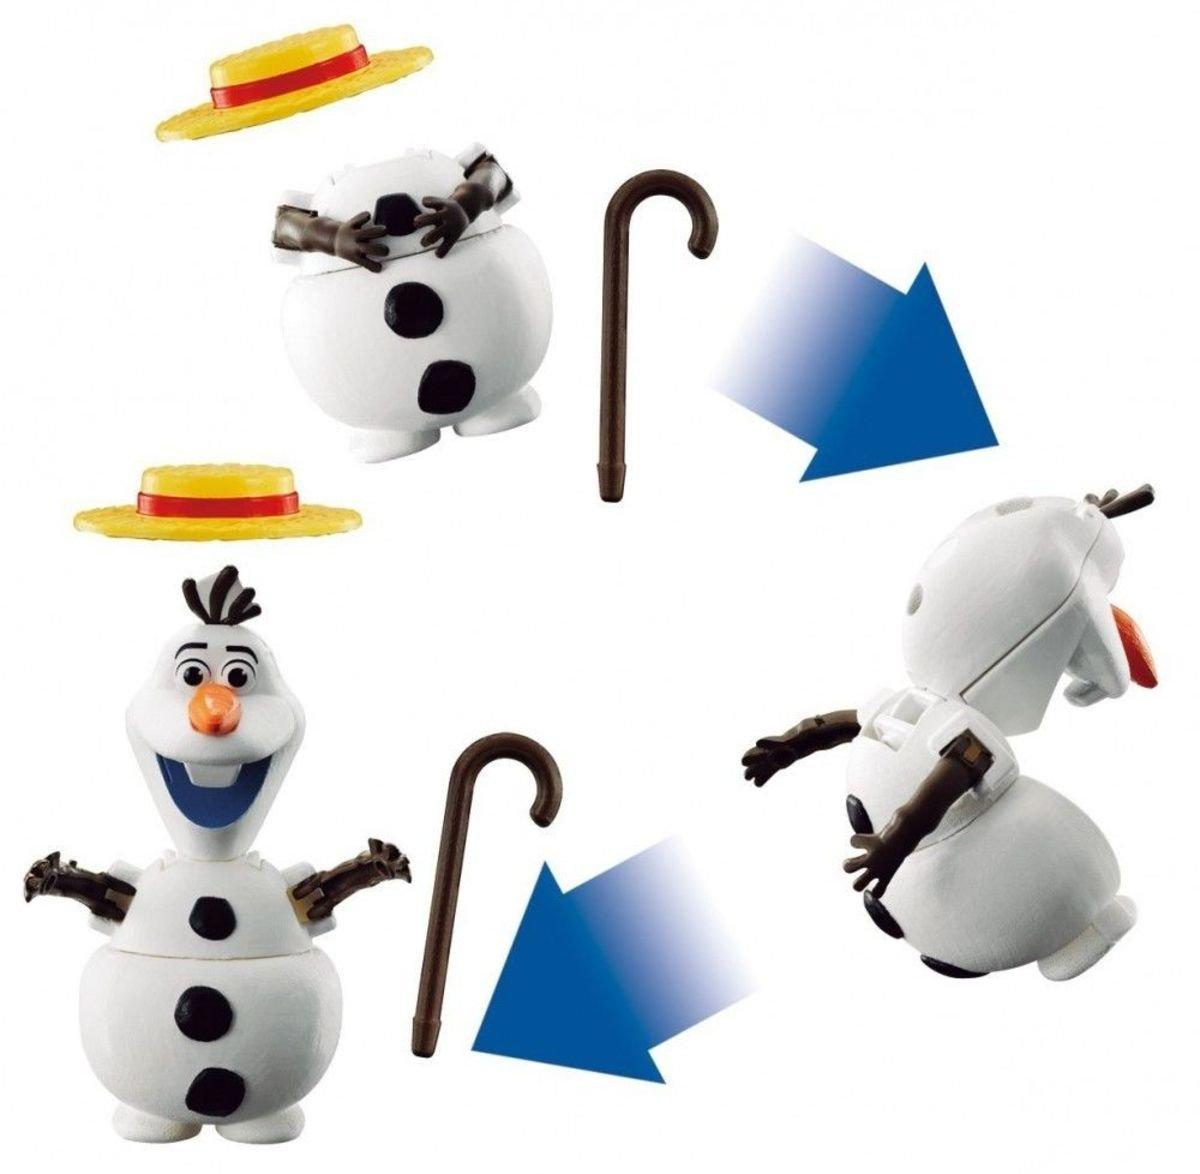 Frozen 魔雪奇緣 Olaf 雪寶 扭蛋